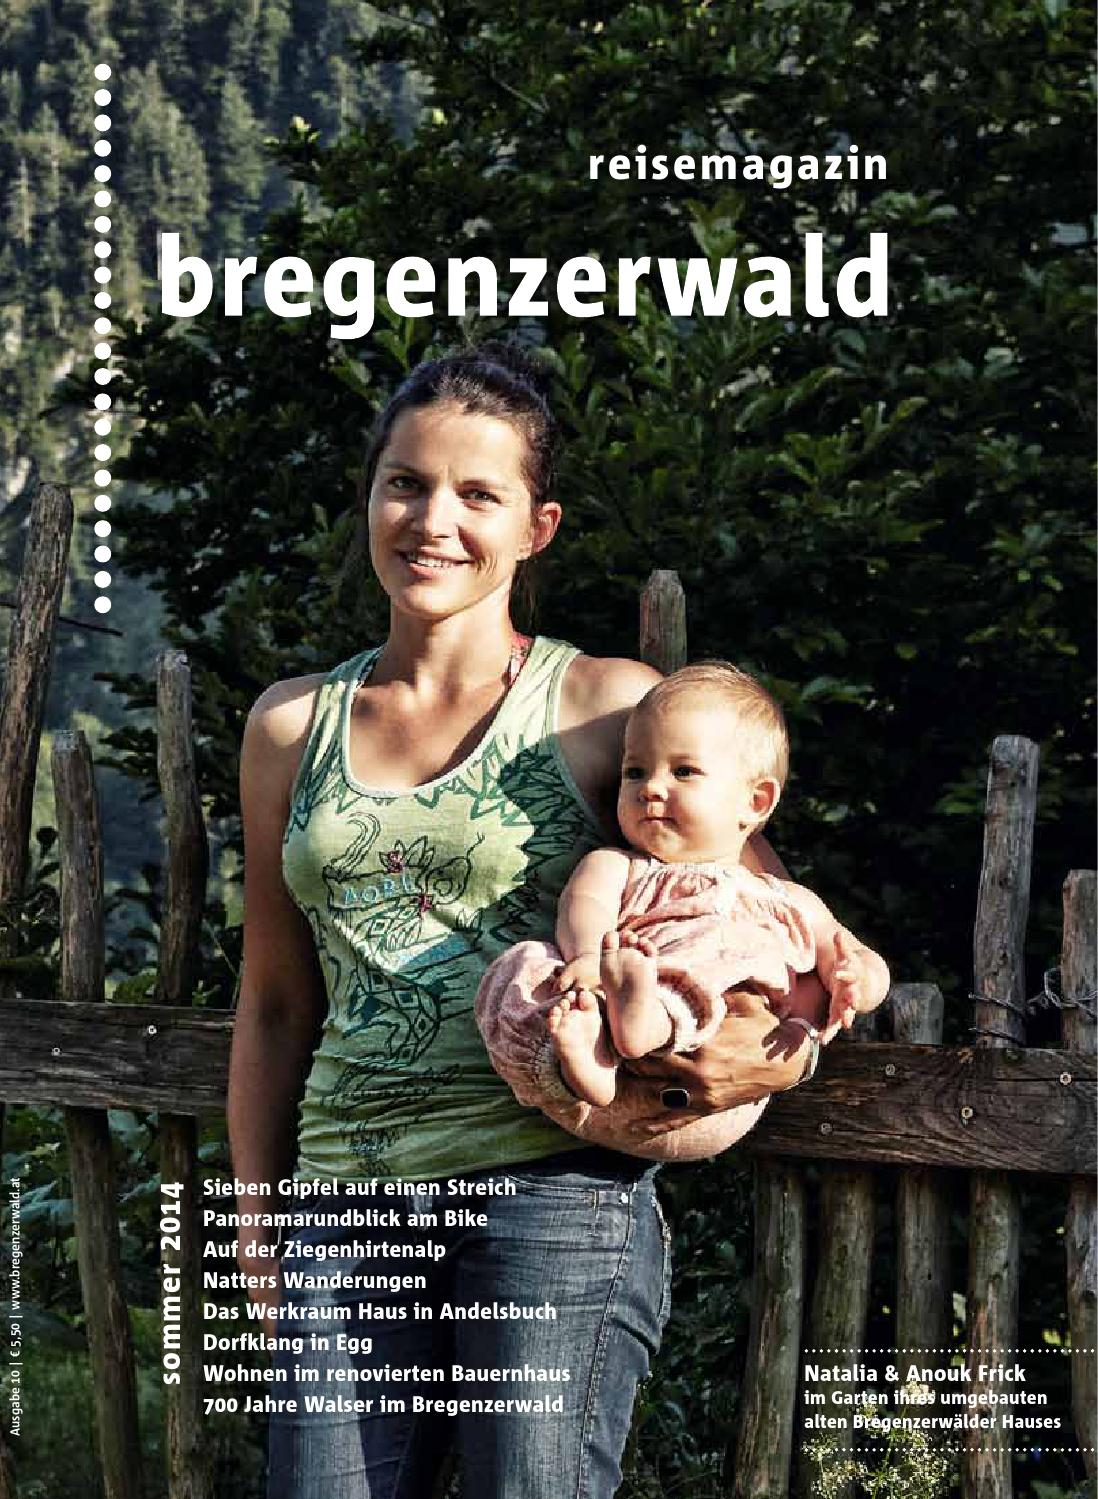 Meine stadt singles in andelsbuch. Partnersuche in Bad Wildbad